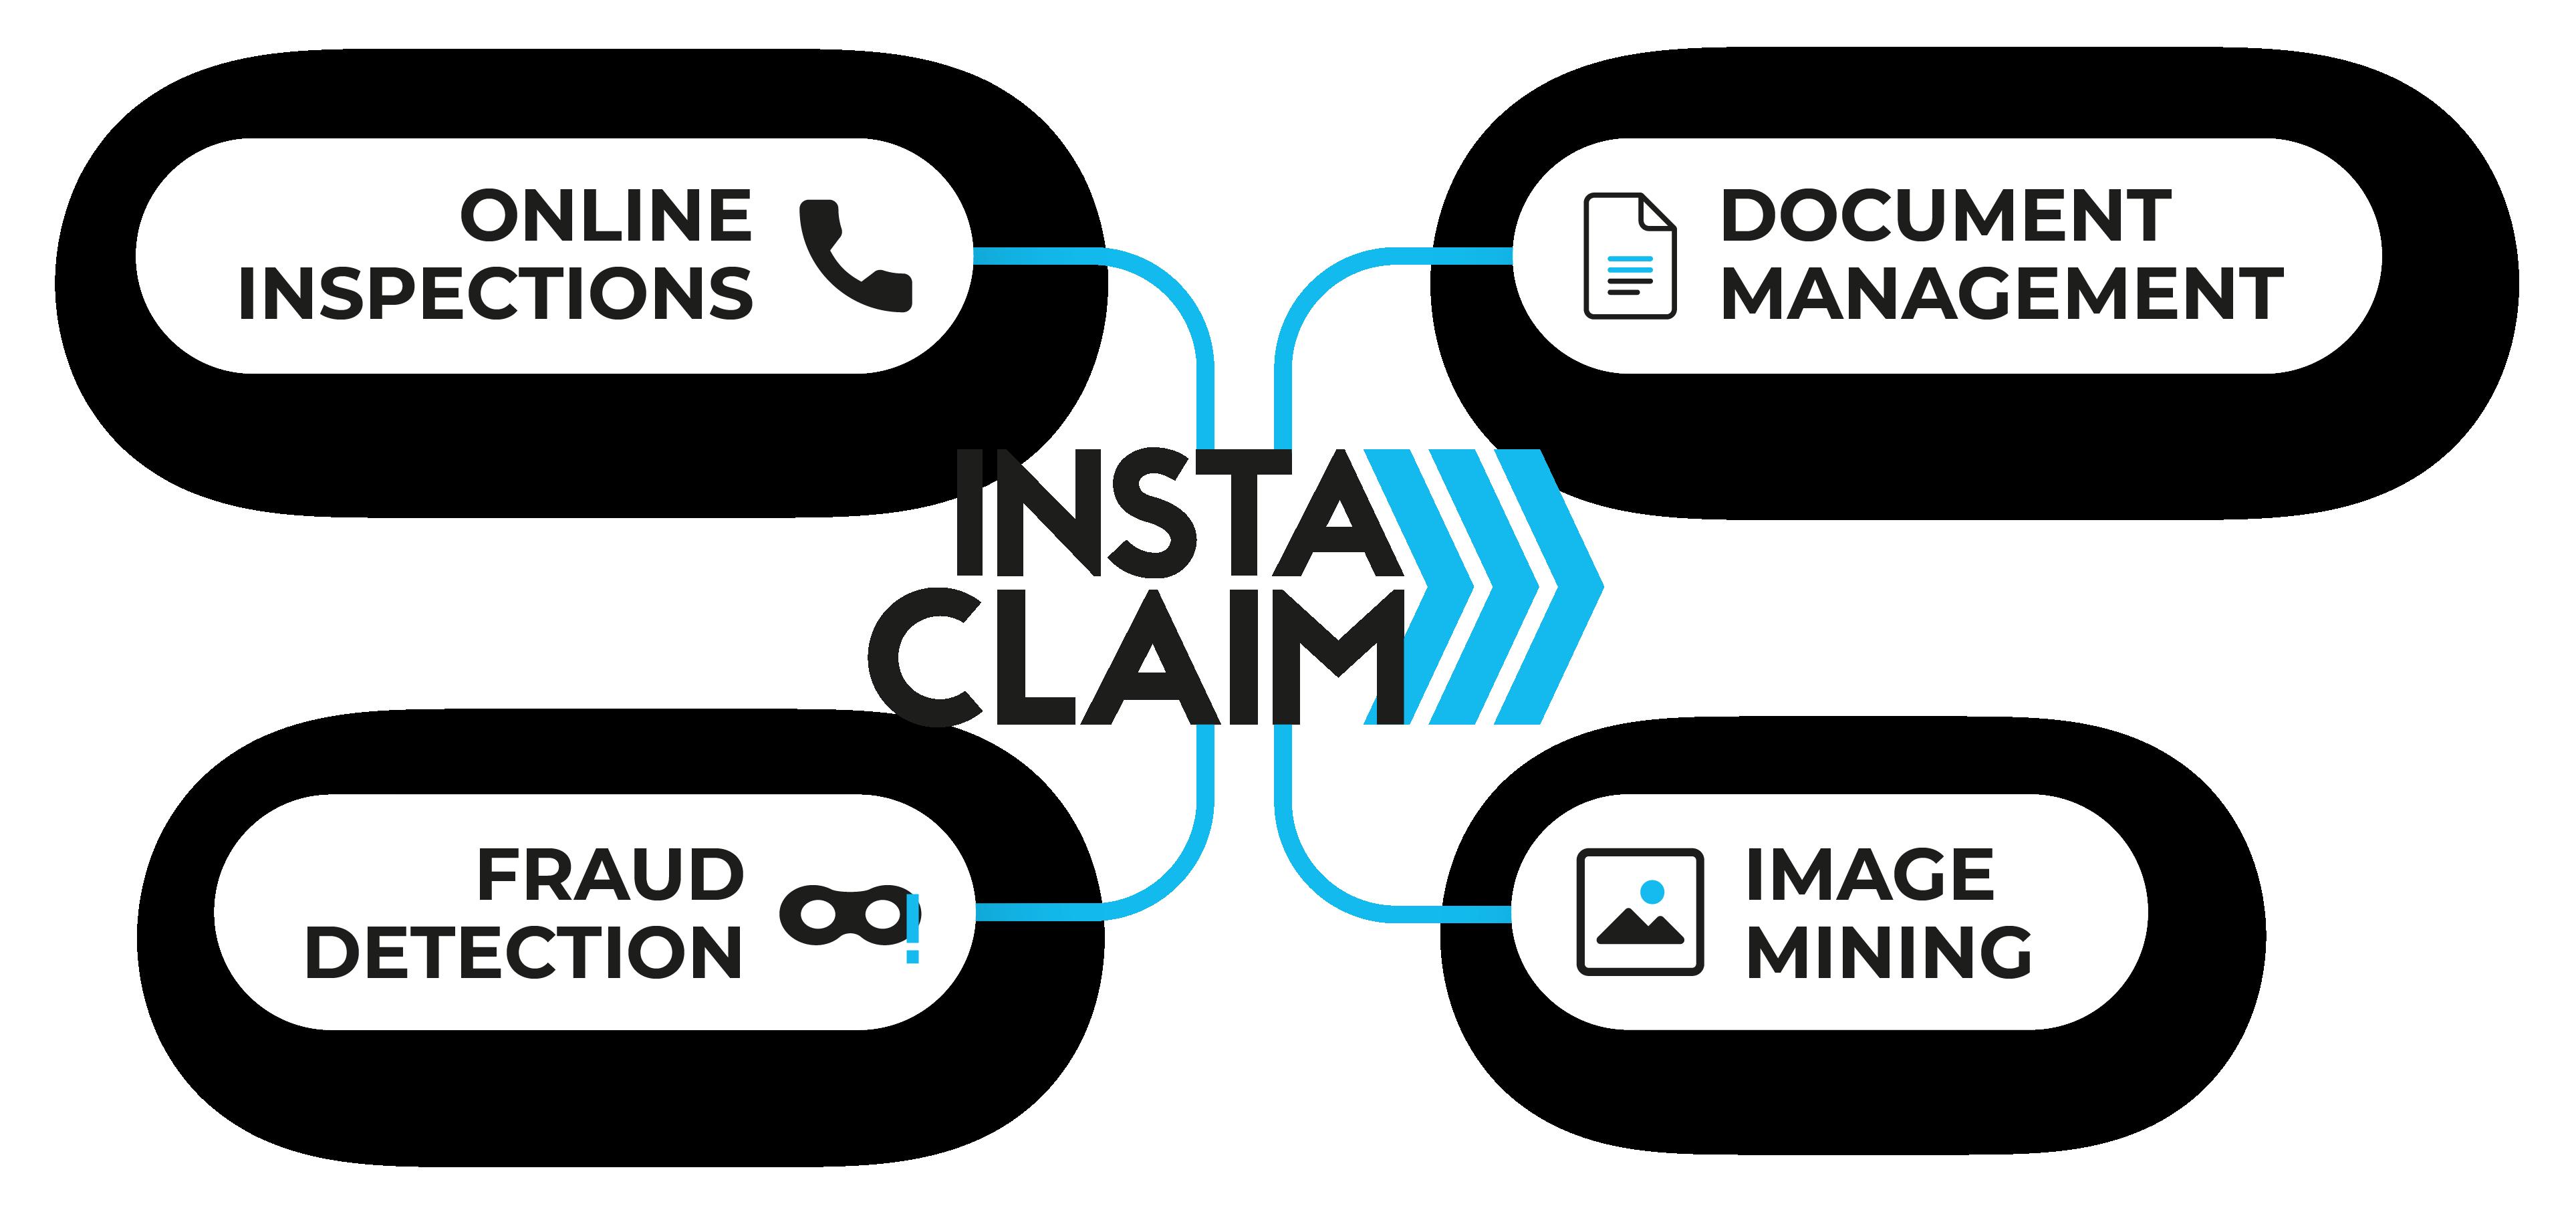 InstaClaim modules